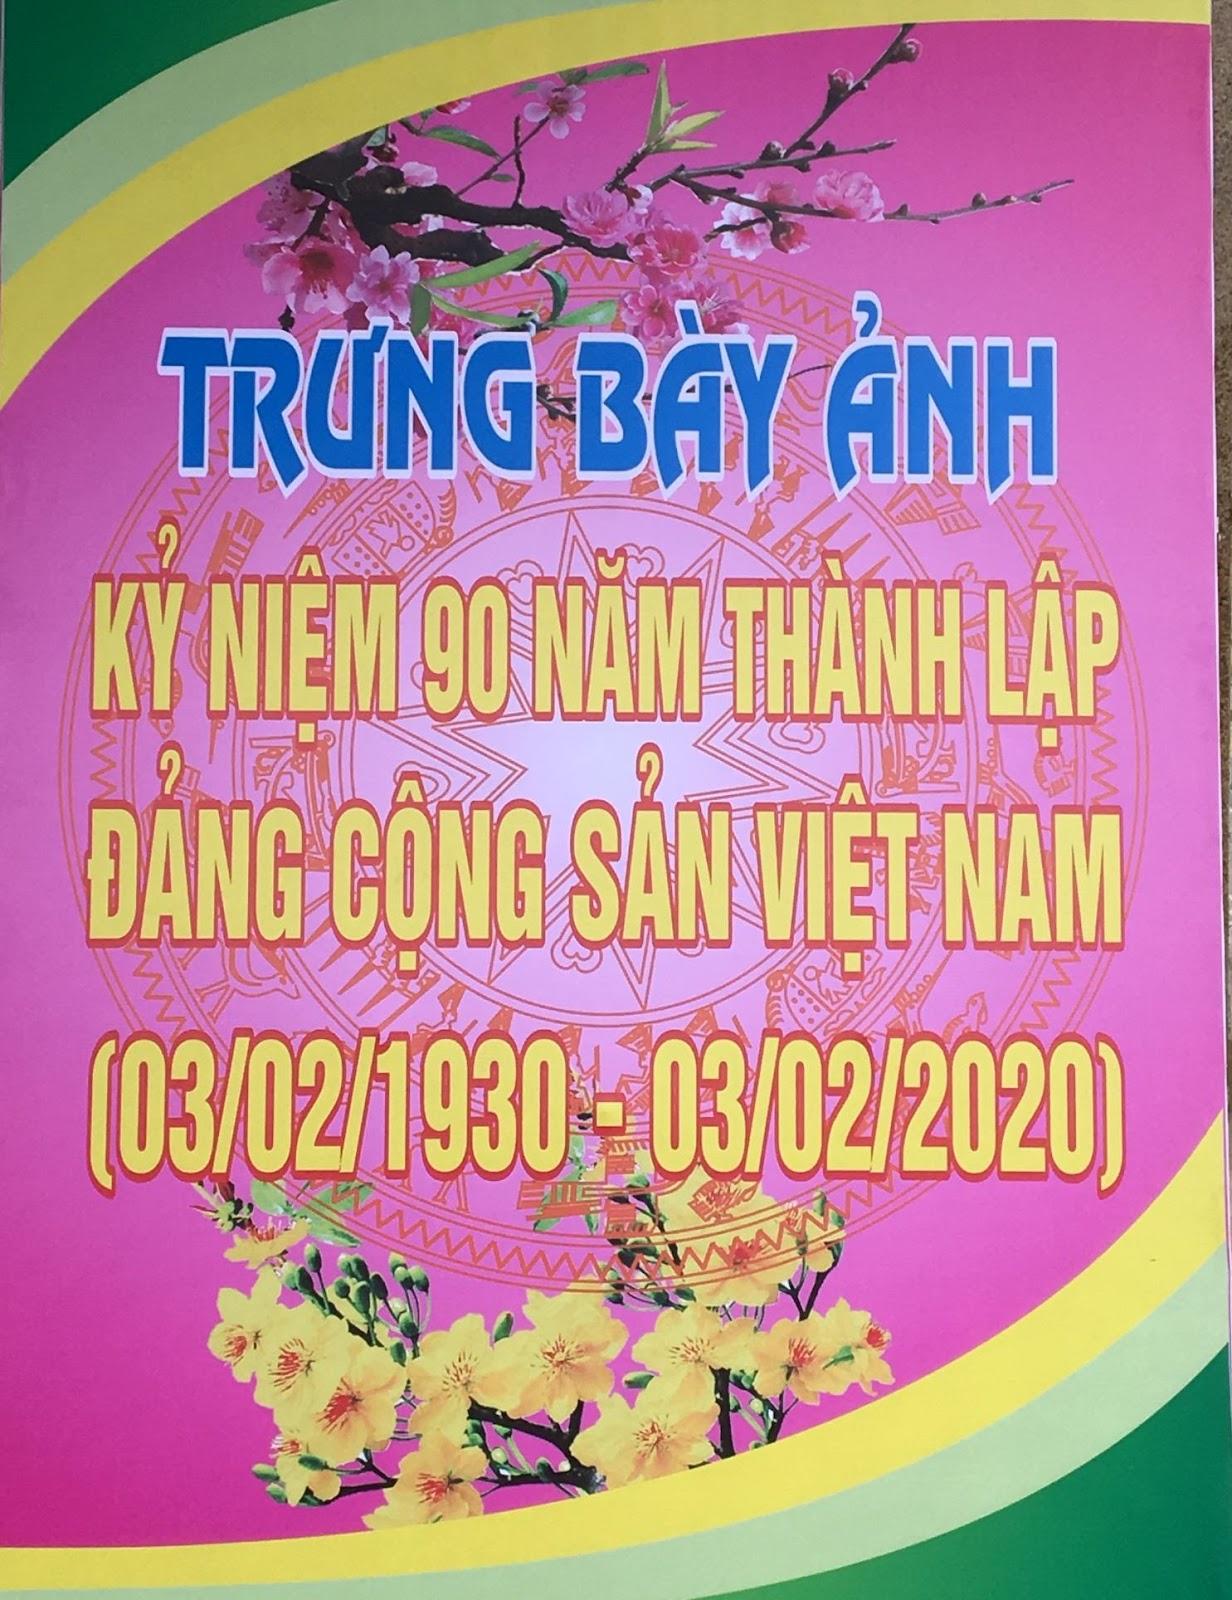 C:\Users\Linh\Downloads\IMG_6978.JPG